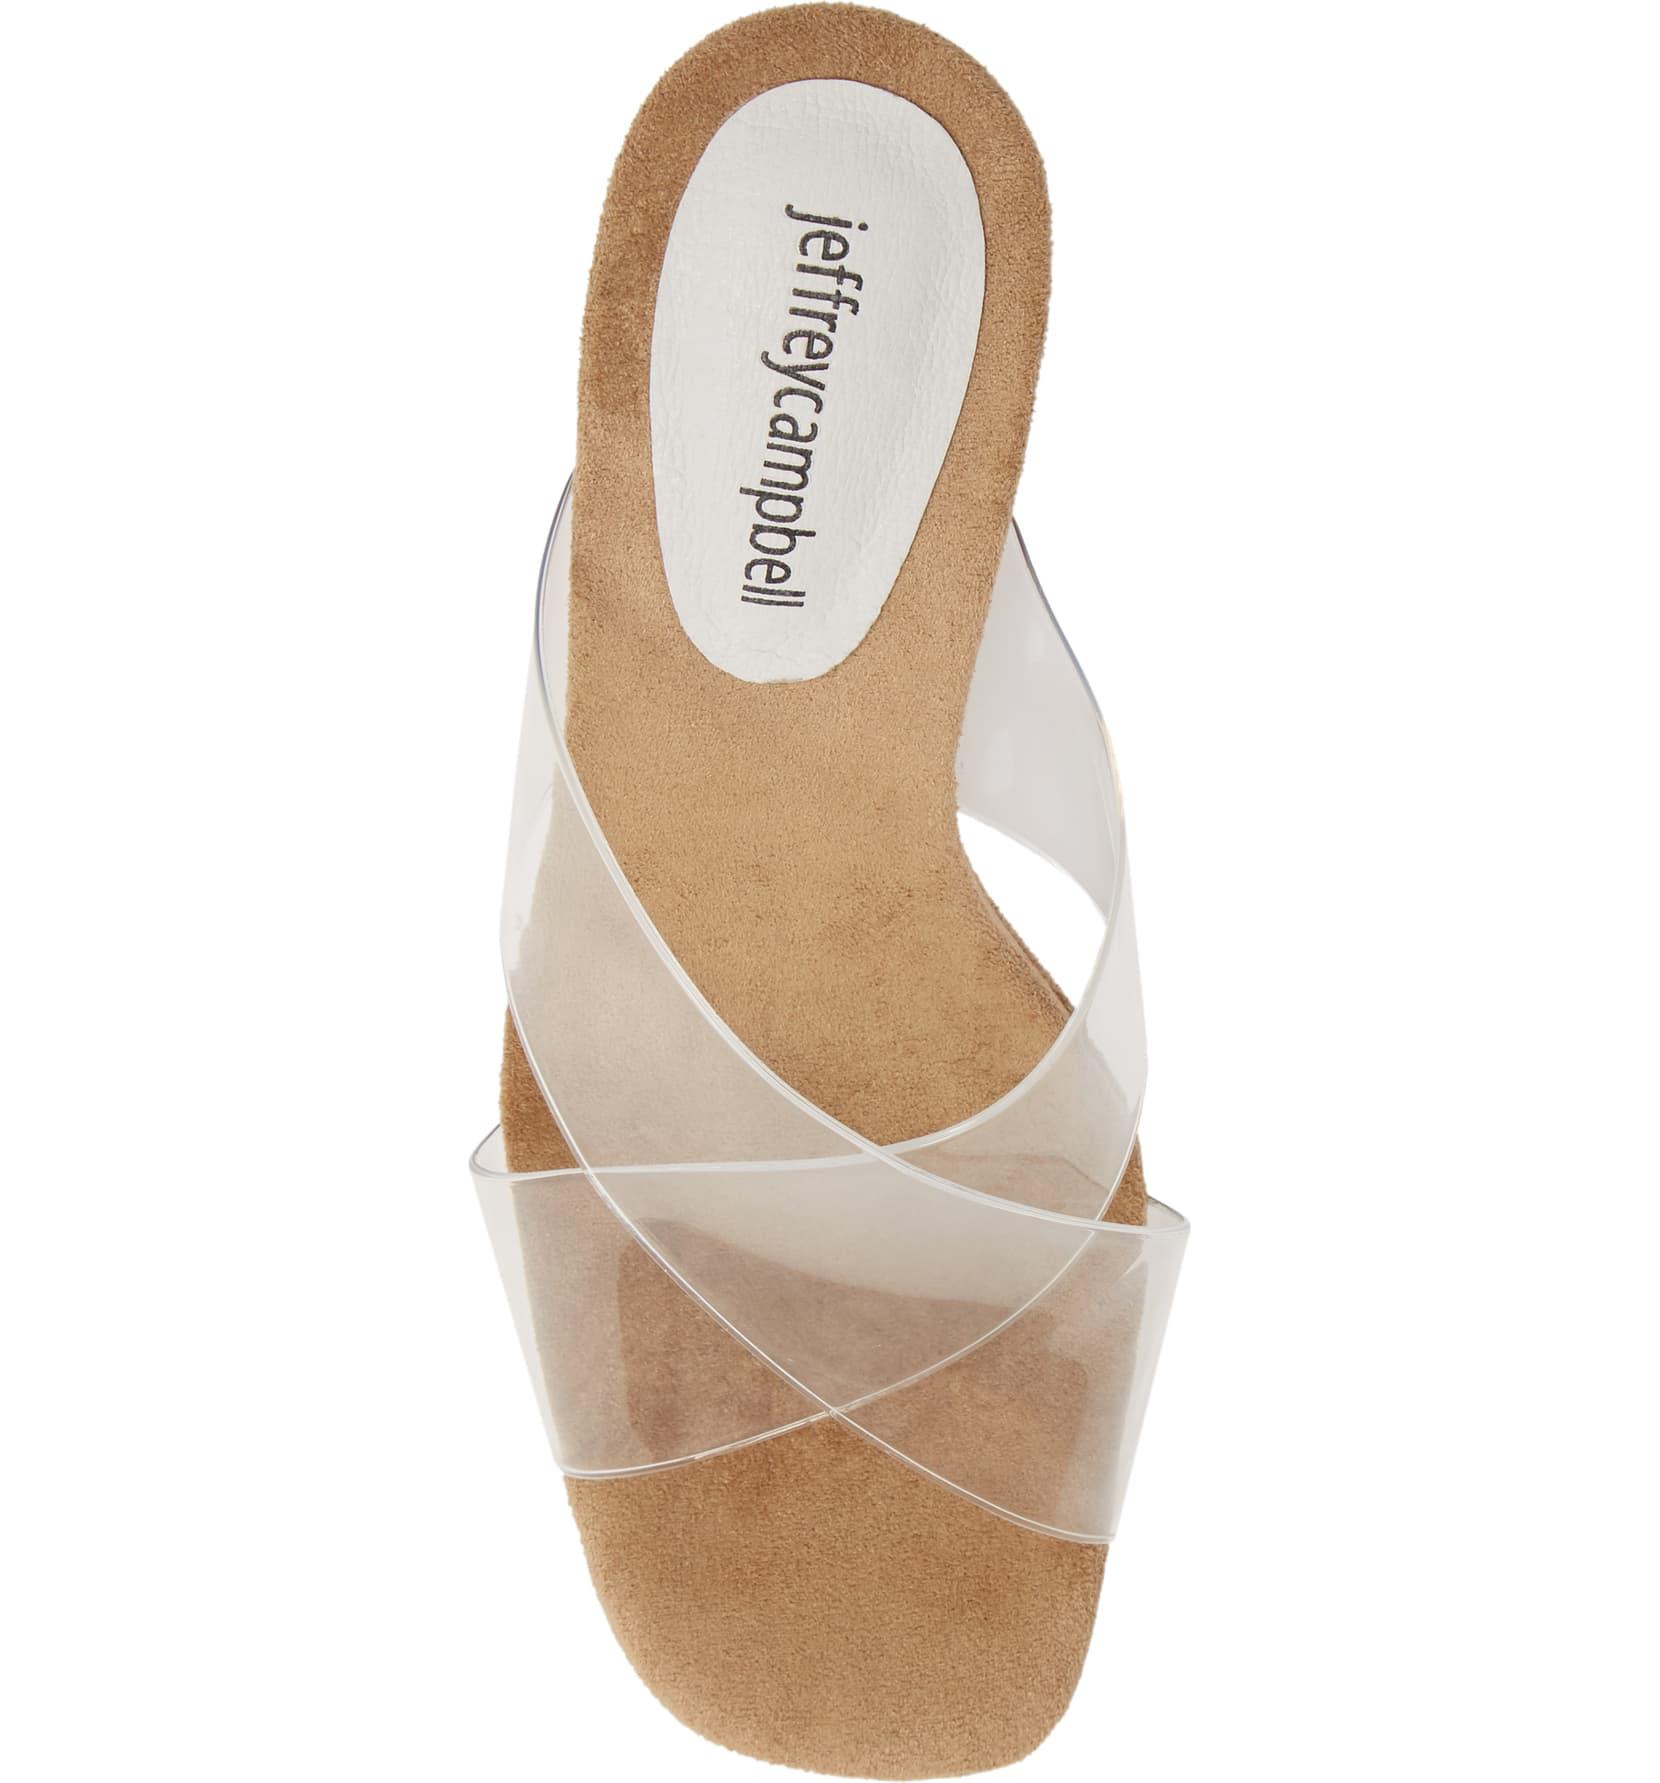 Jeffrey-Campbell-Women-039-s-Mystical-Wedge-Transparent-Straps-Wedge-Heeled-Sandals thumbnail 6